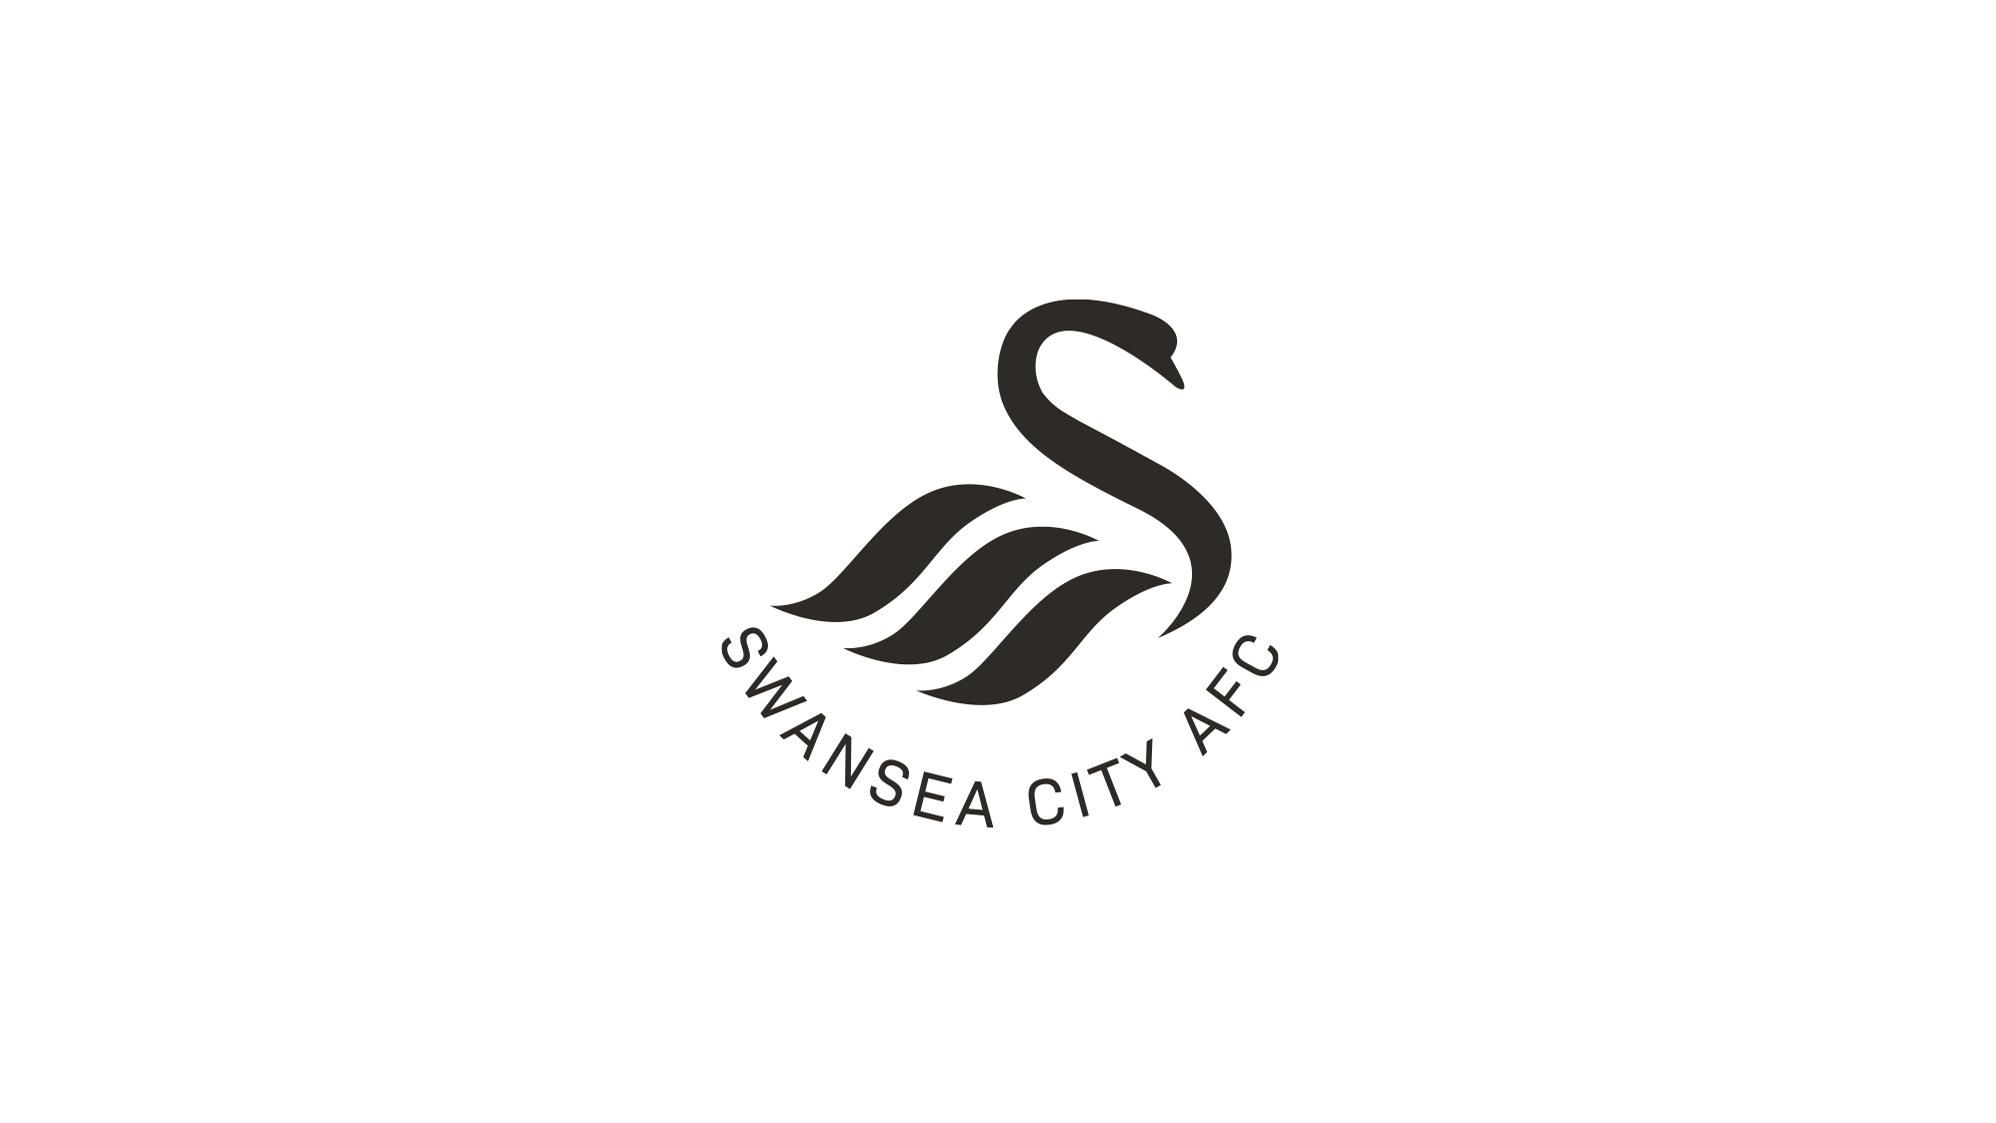 Latest club crest white